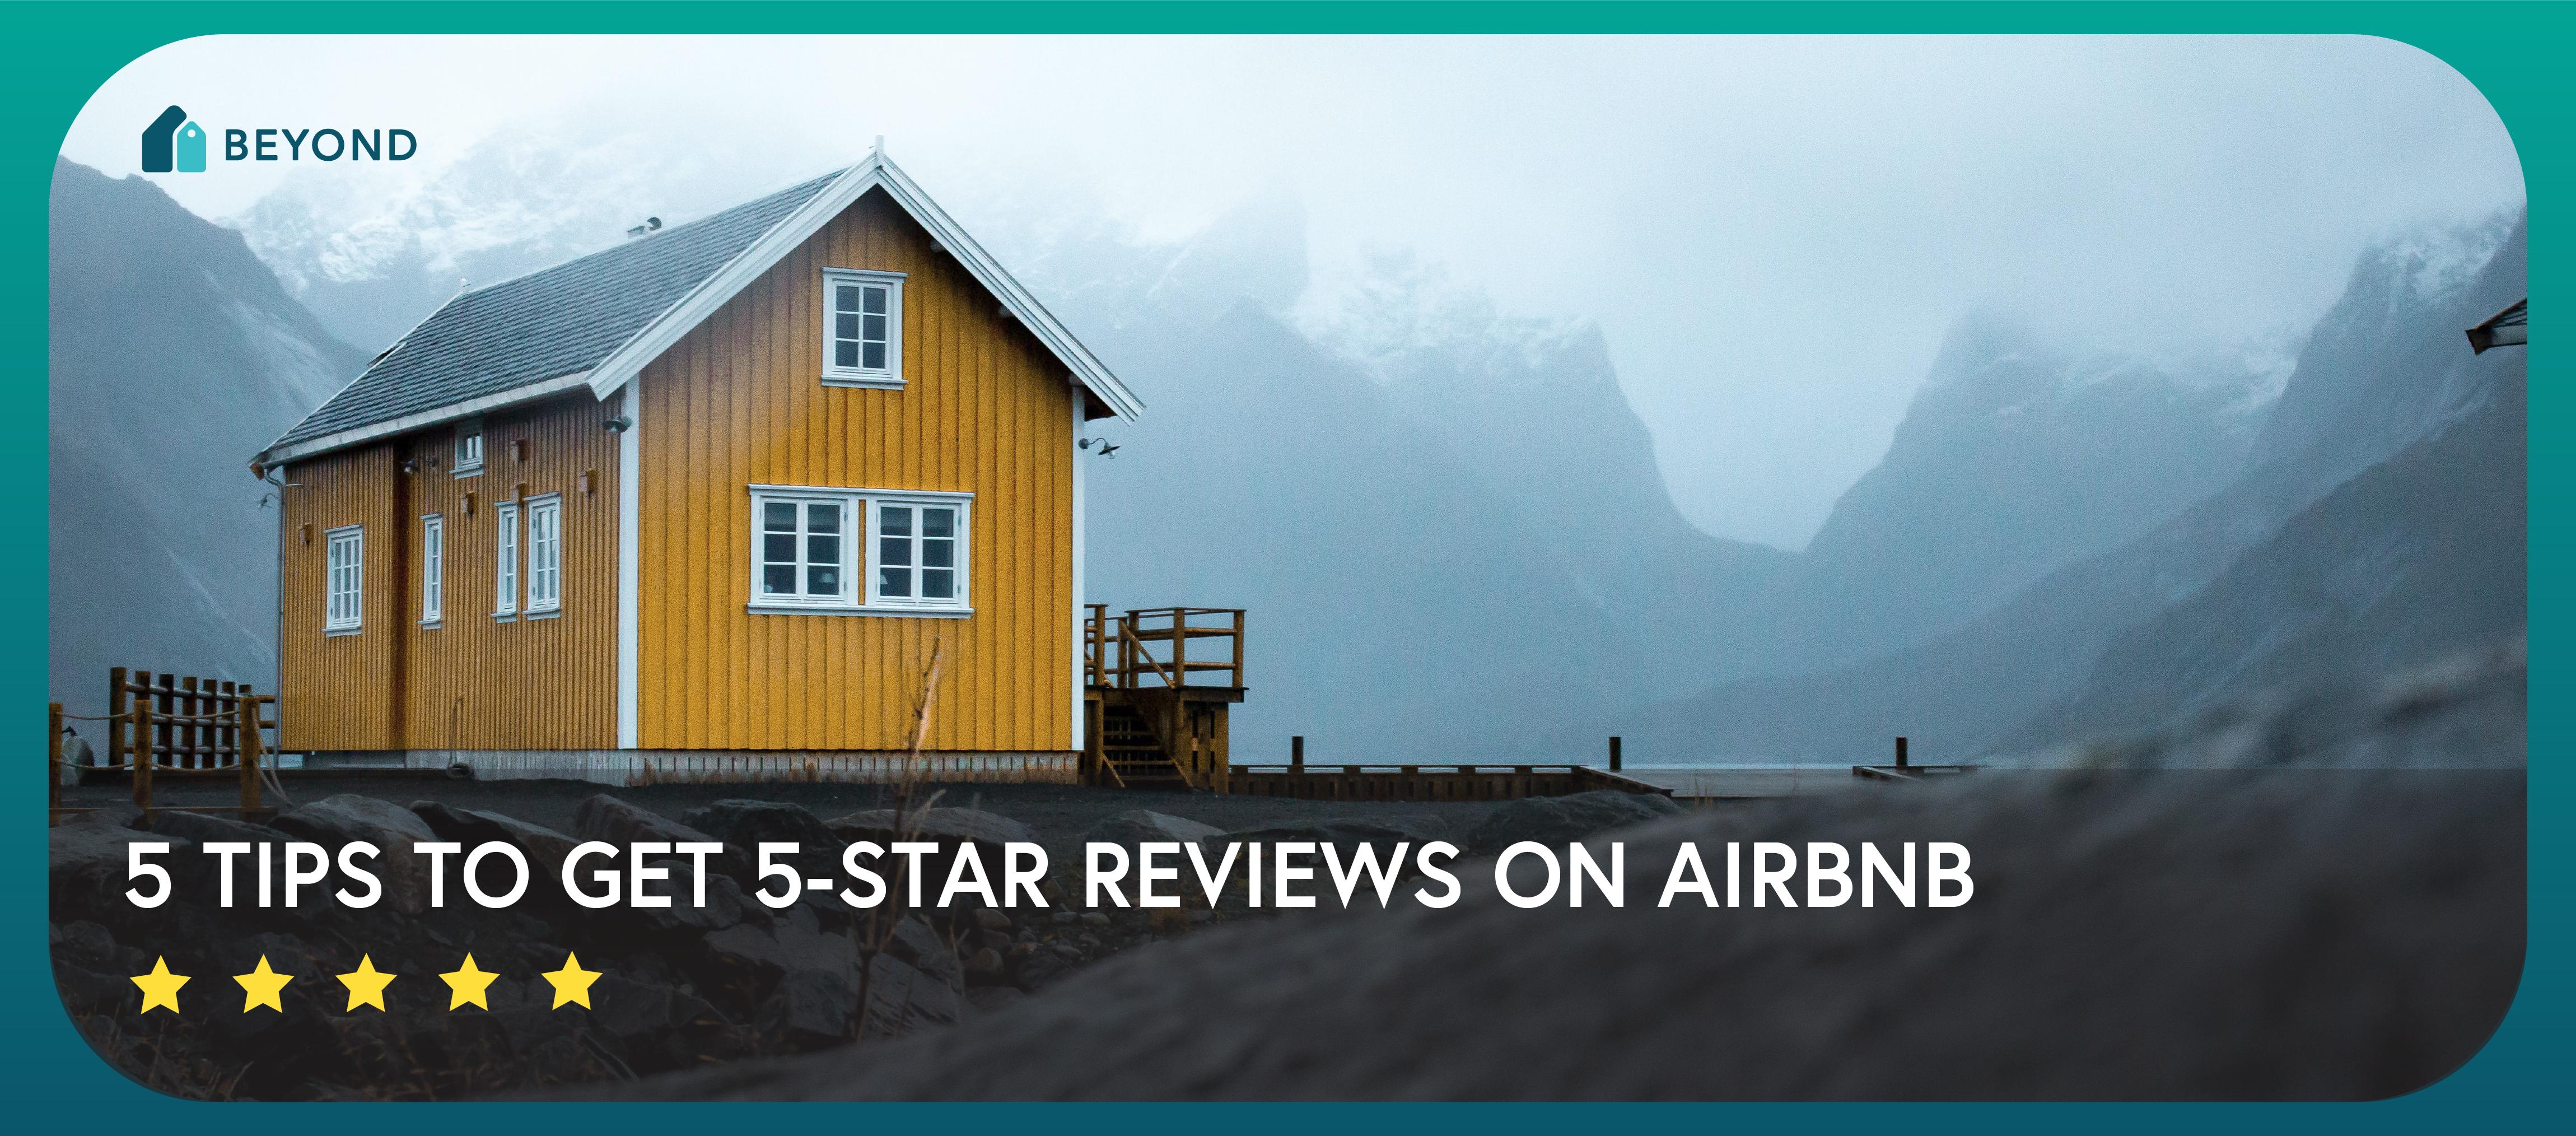 bm_5 tips Airbnb